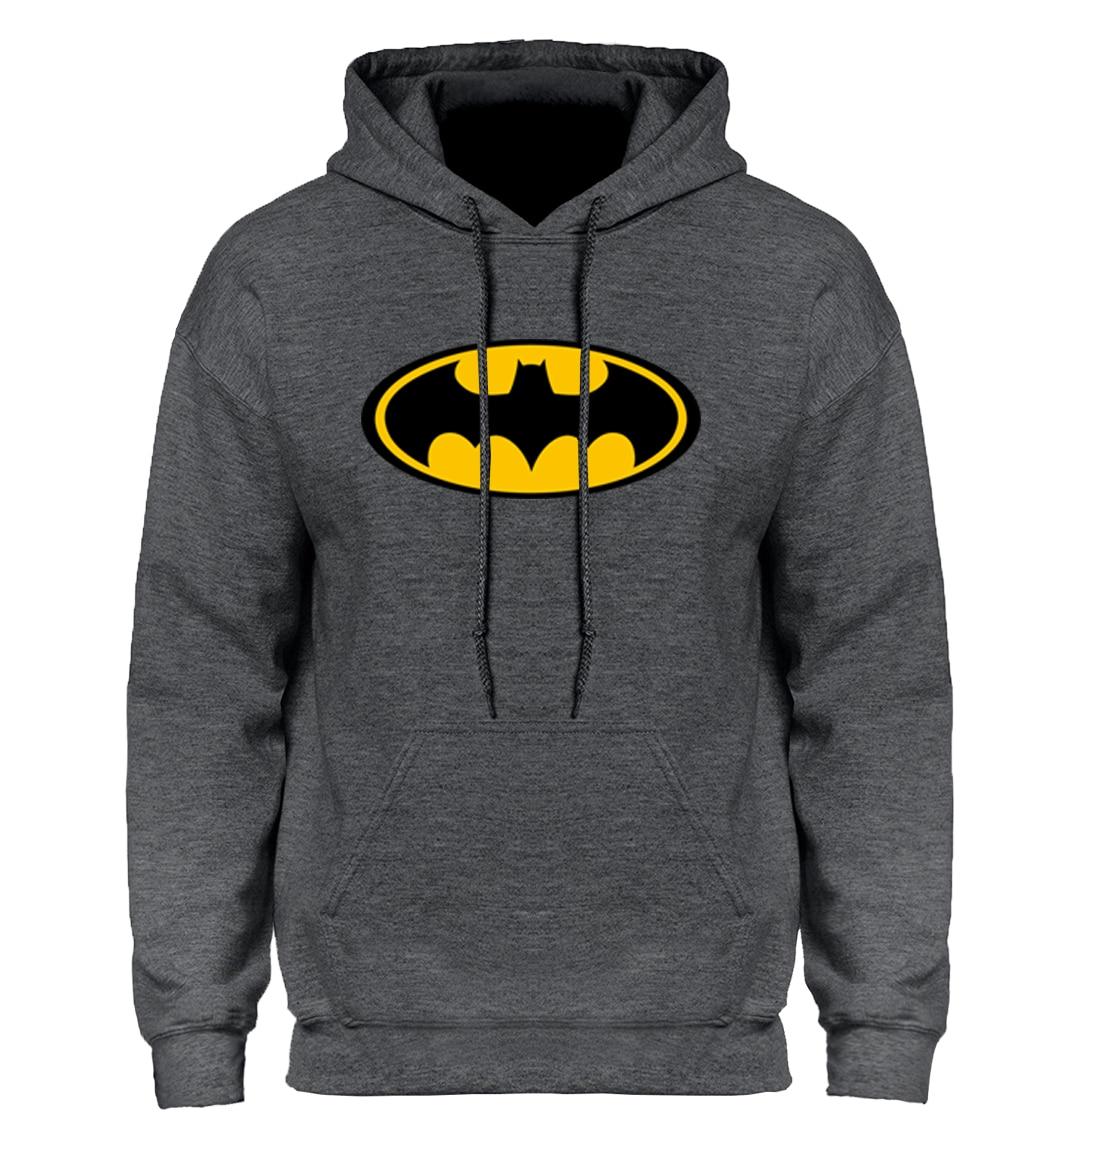 Superhero Hoodies Mens Bat Hoodie Men Winter Autumn Loose Cartoon Harajuku Hooded Sweatshirt Hipster Fleece Warm Sweatshirts